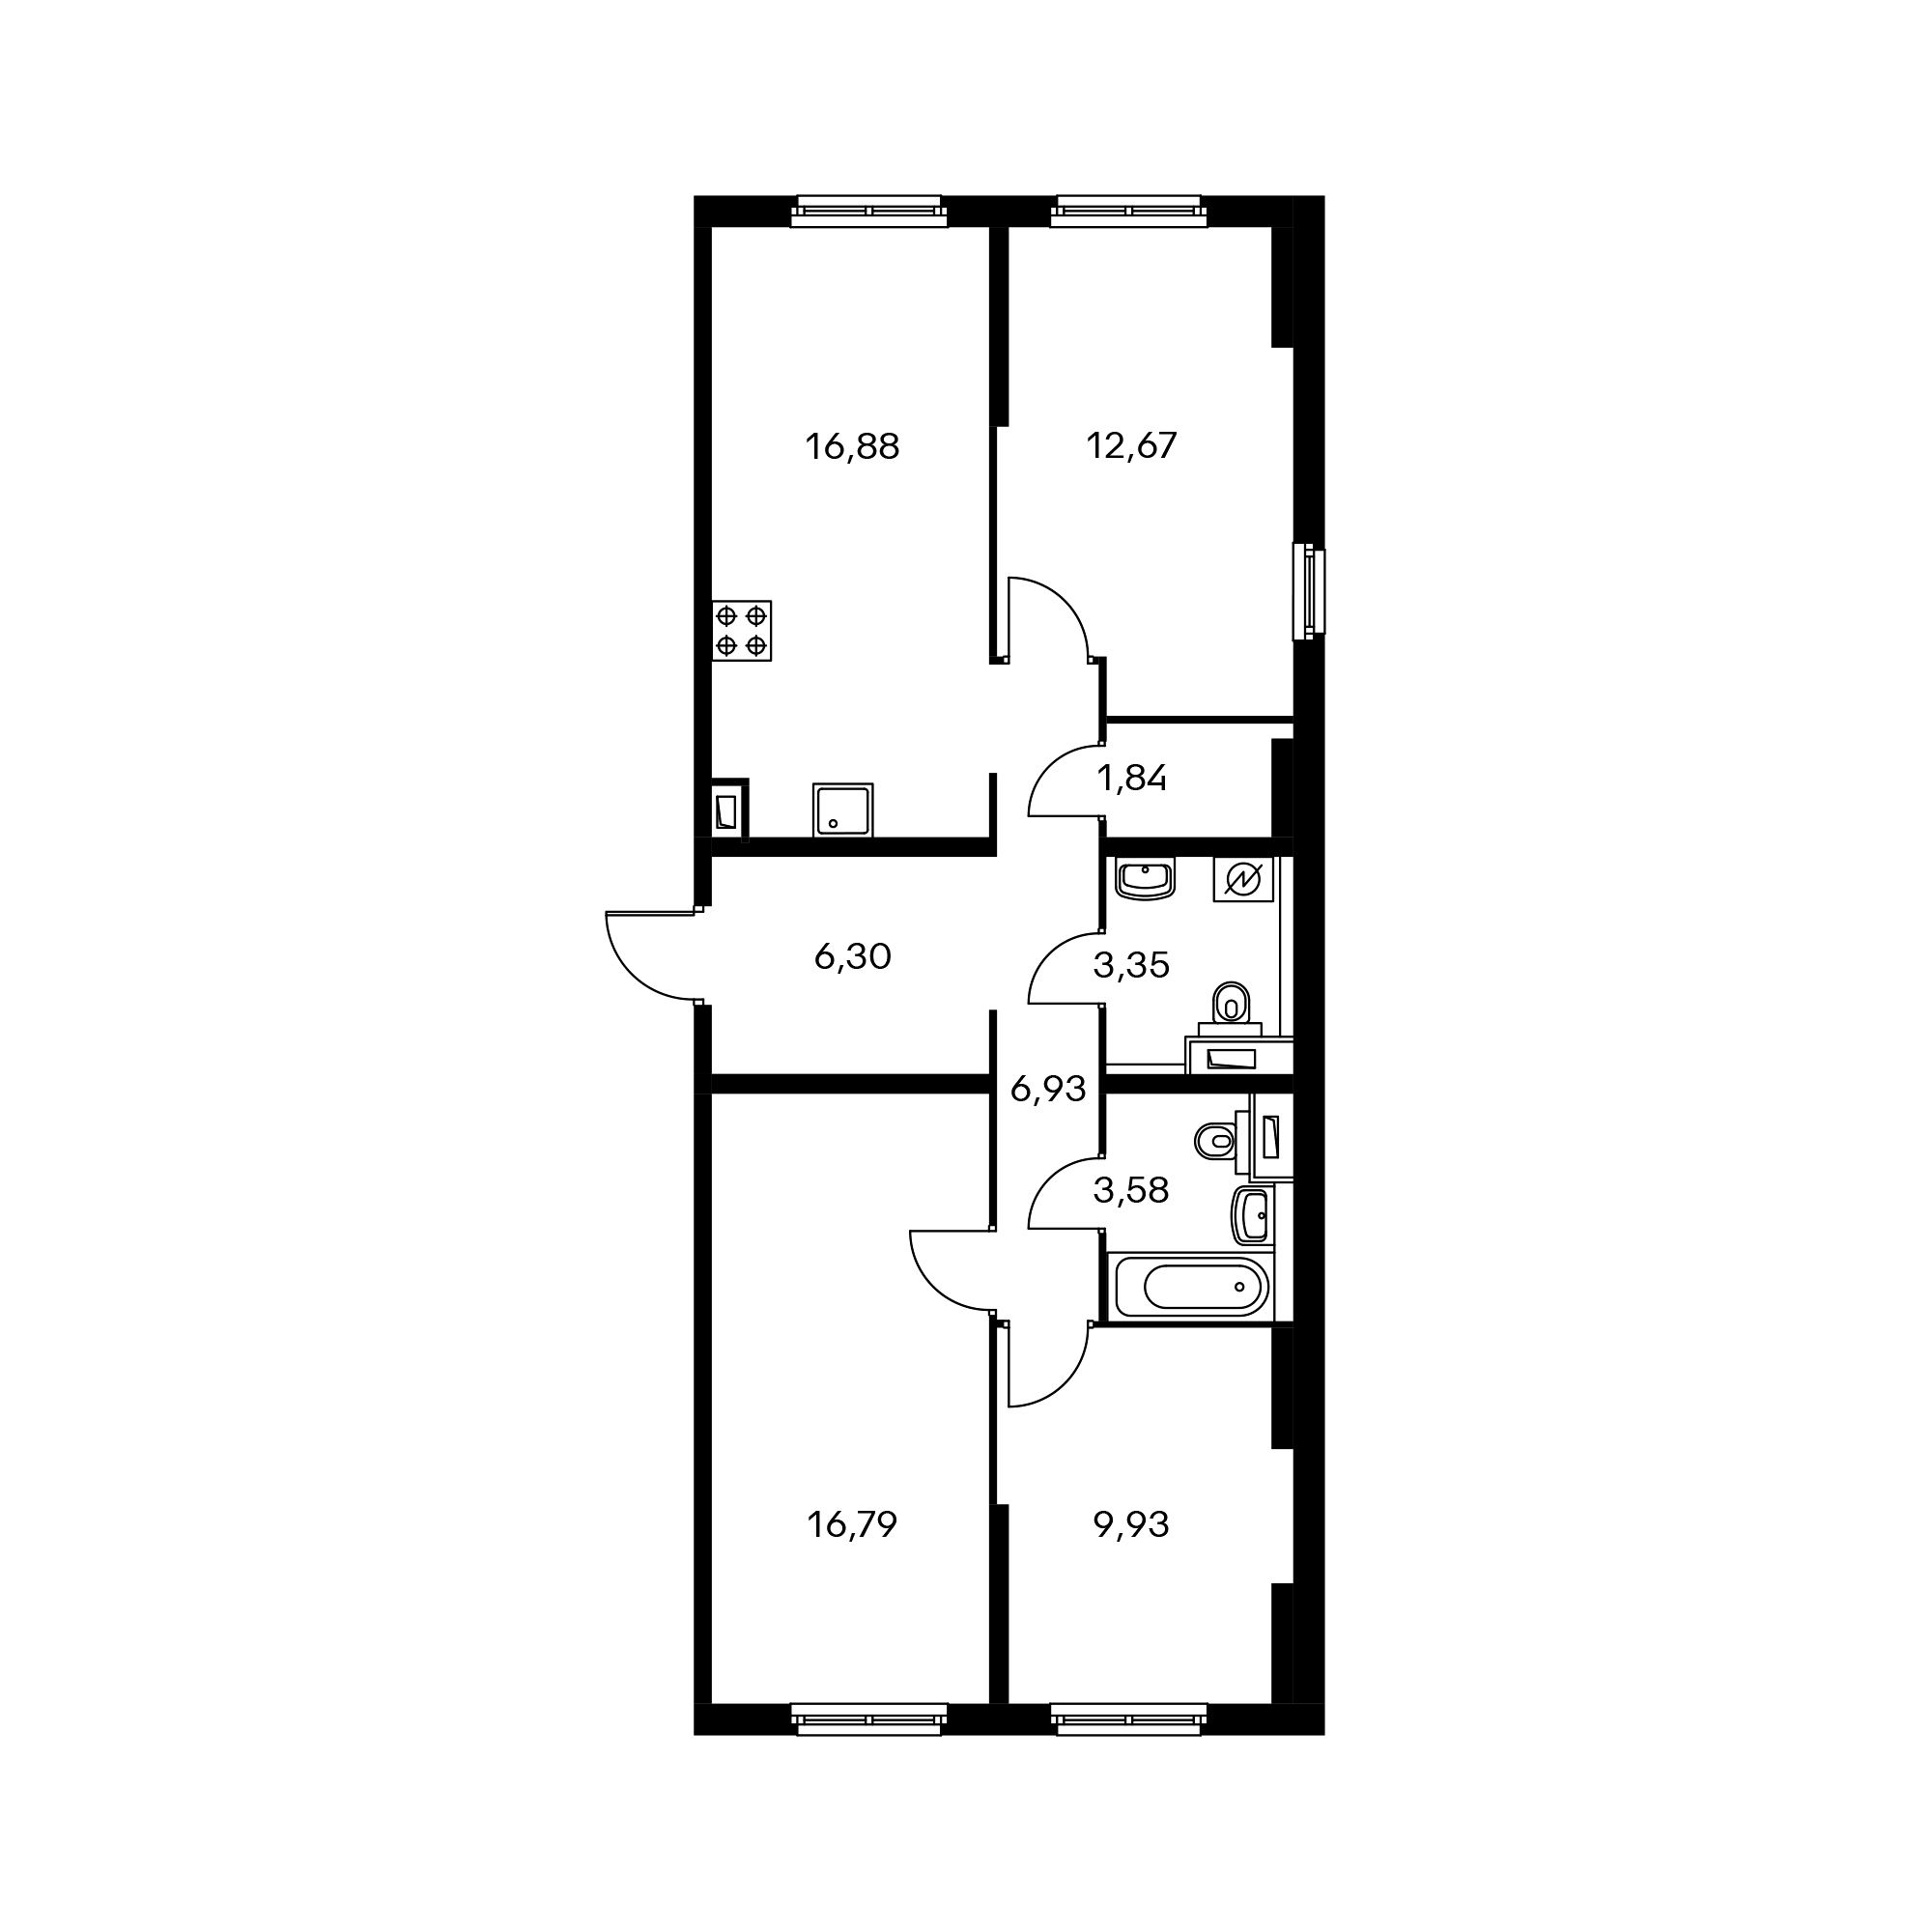 3KM16_6.0-1_S_Z3